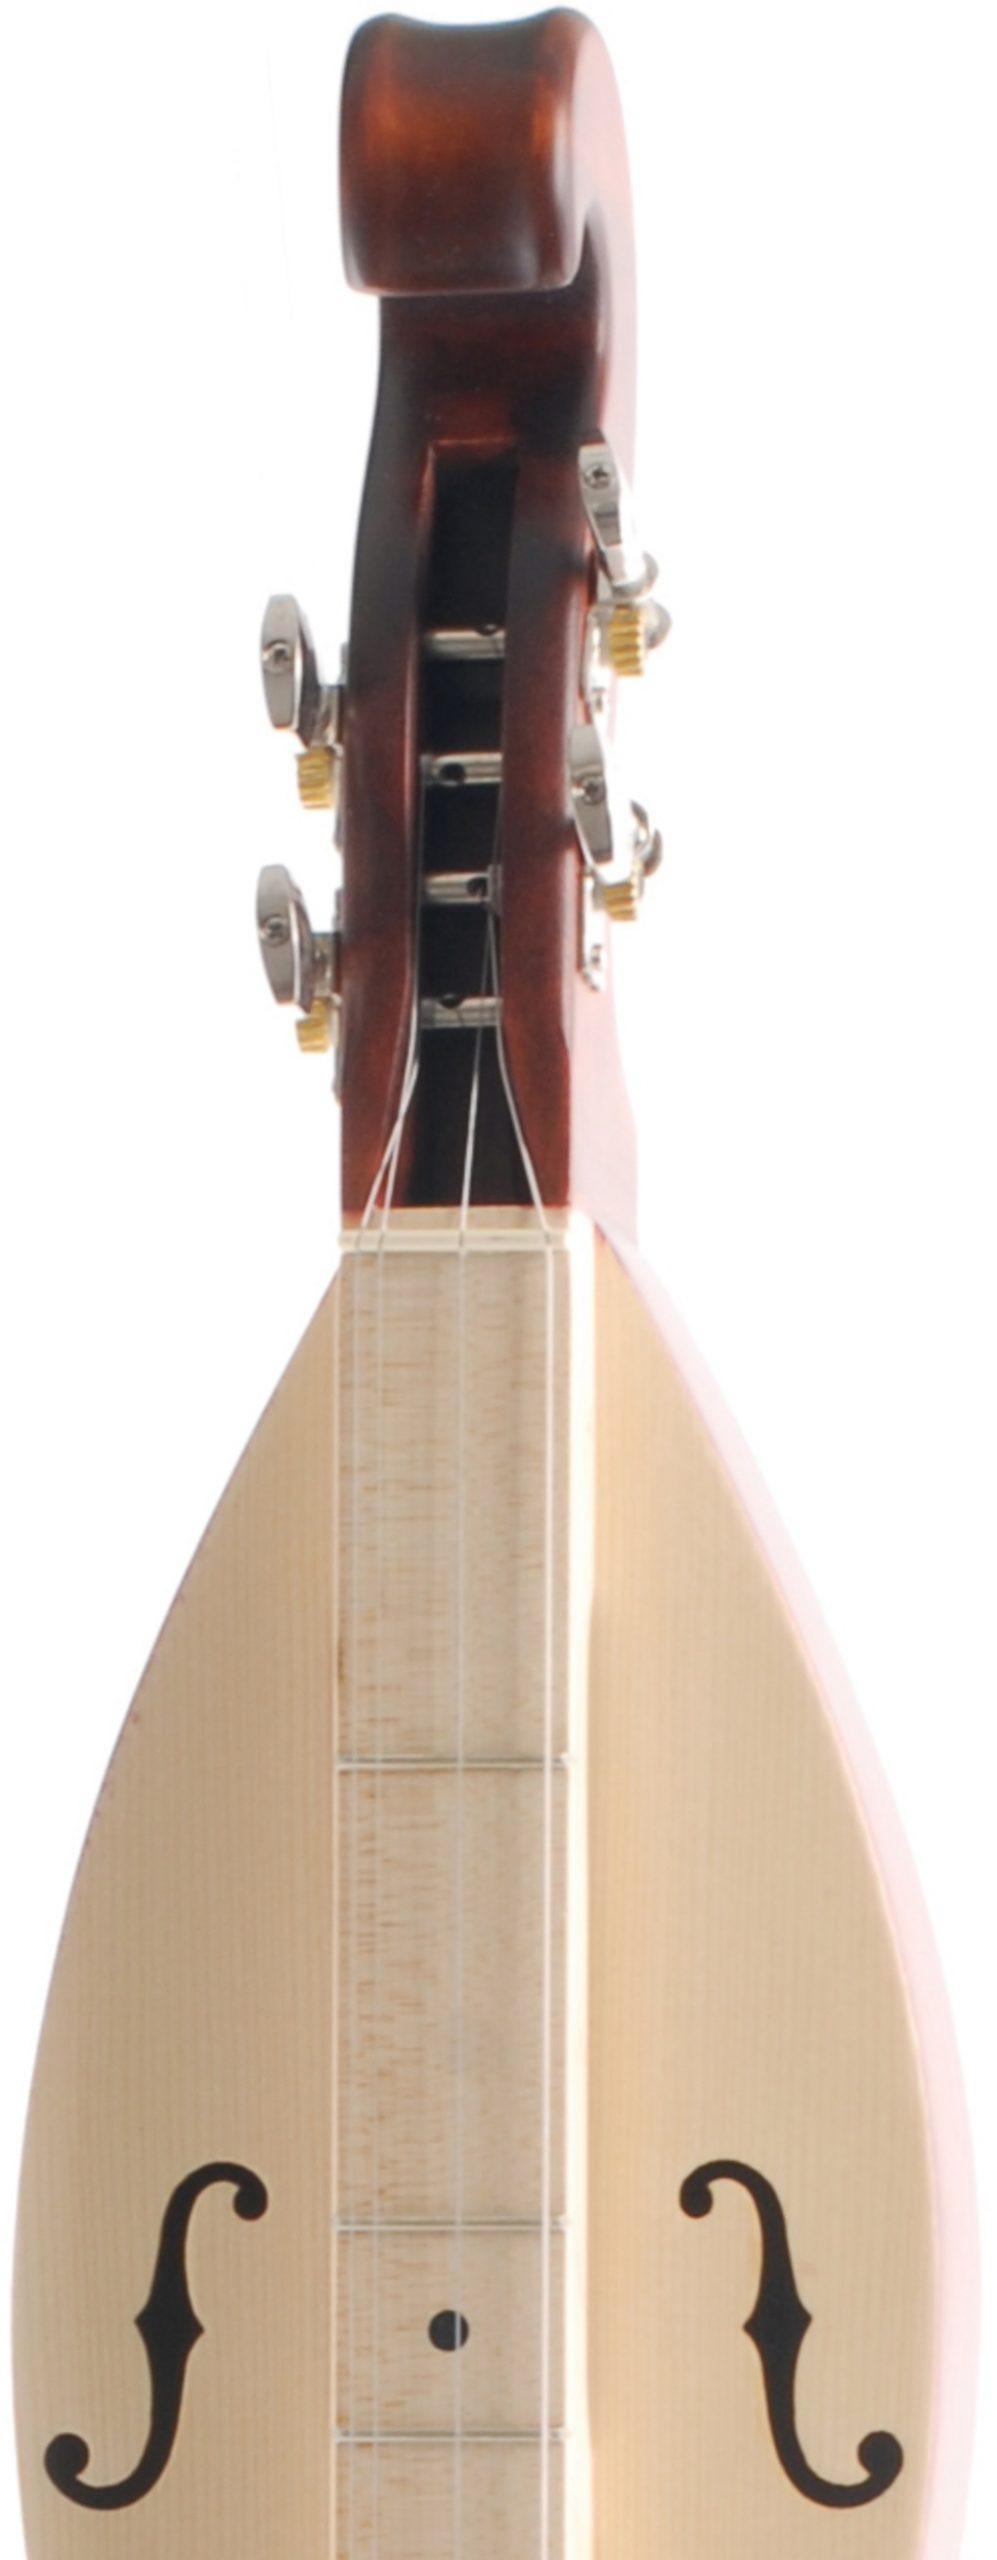 APPALACHIAN DULCIMER GRANDE TOP ABETE FONDO LIME FASCE E MANICO ACERO SCALA 68,5CM CON BORSA 6